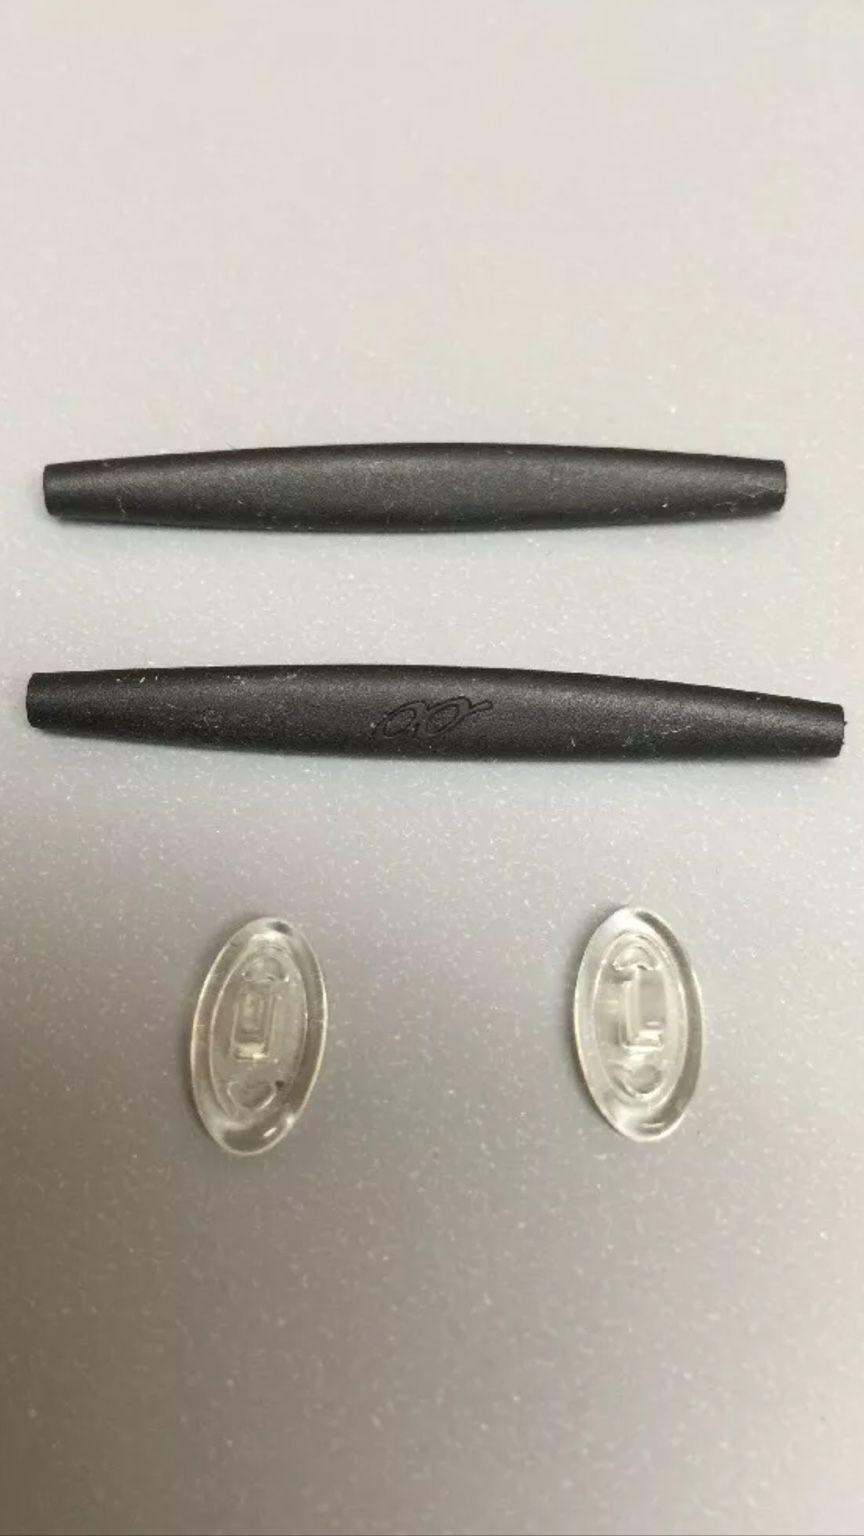 Jordan OO Wire kits - 37b678f9b770b5082cafc7c5805c629d.jpg